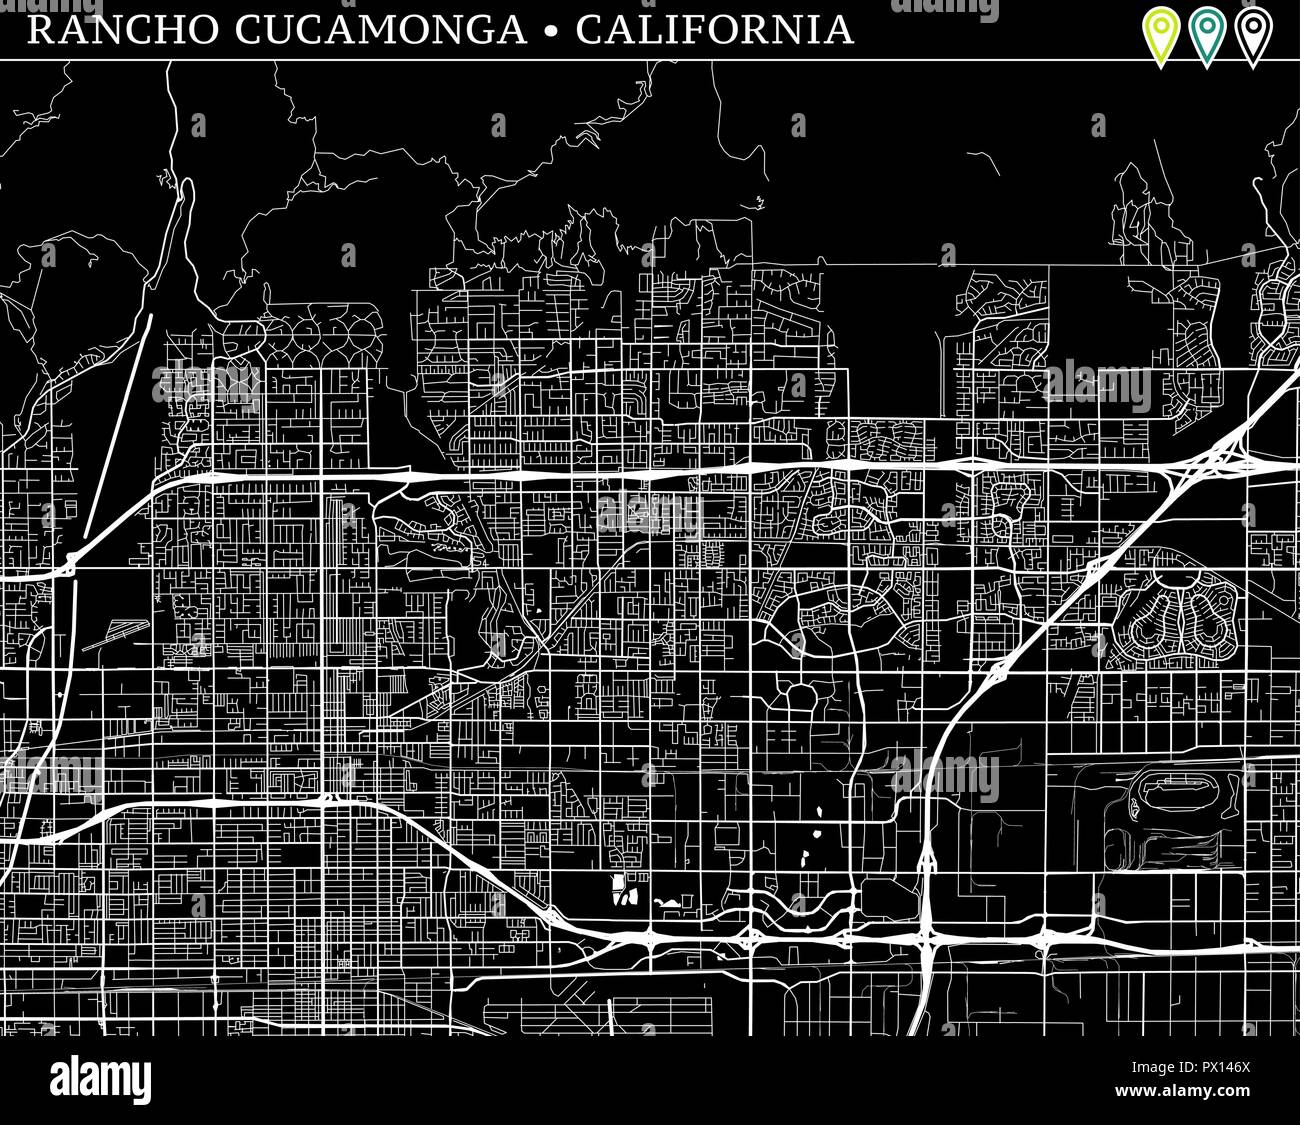 Cucamonga California Map.Simple Map Of Rancho Cucamonga California Usa Black And White